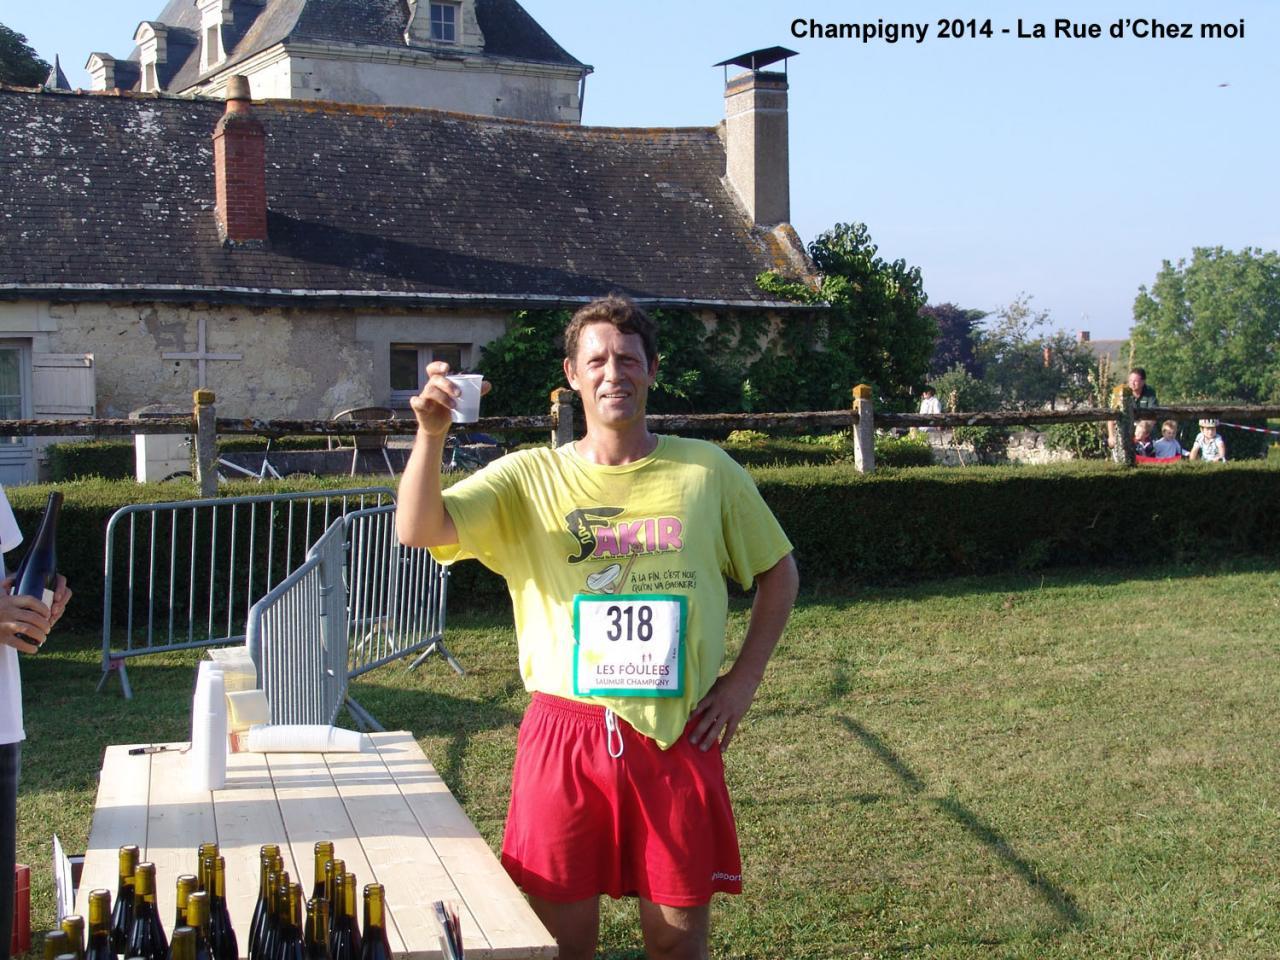 Champigny 2014 - Rue d'Chez Moi (11)